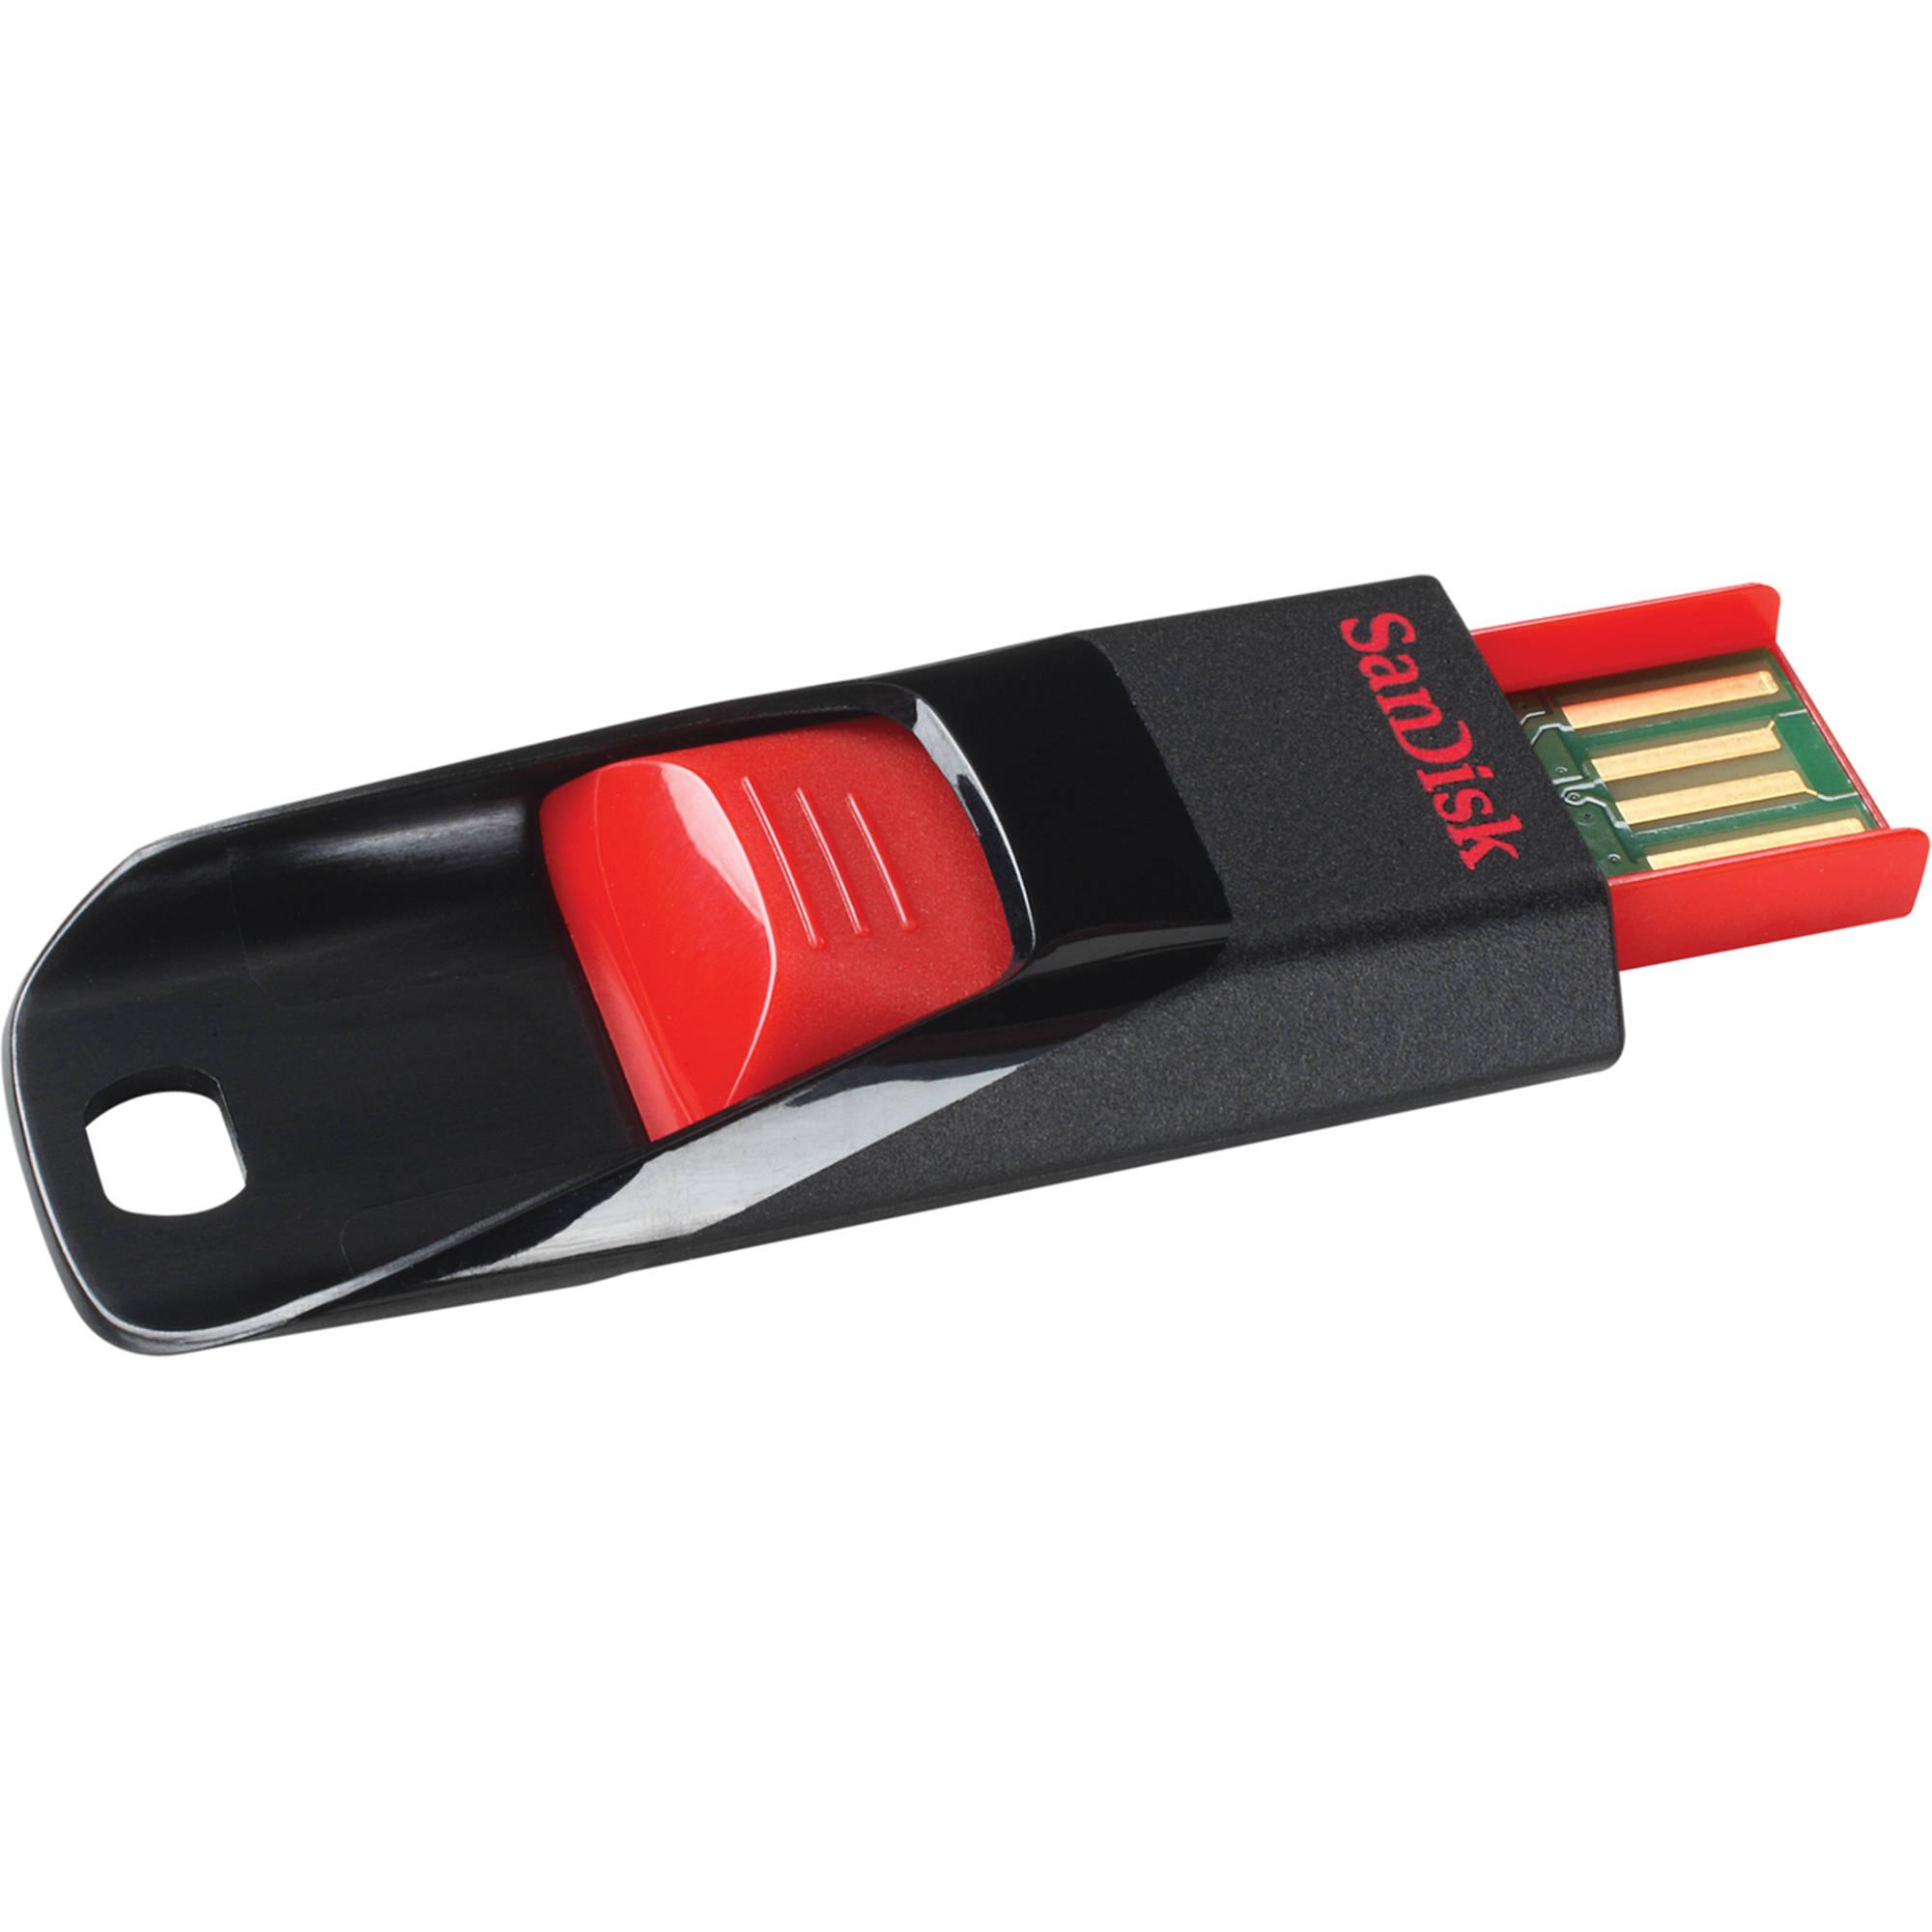 sandisk cruzer edge 4gb usb 2 0 flash drive sdcz51 004g. Black Bedroom Furniture Sets. Home Design Ideas